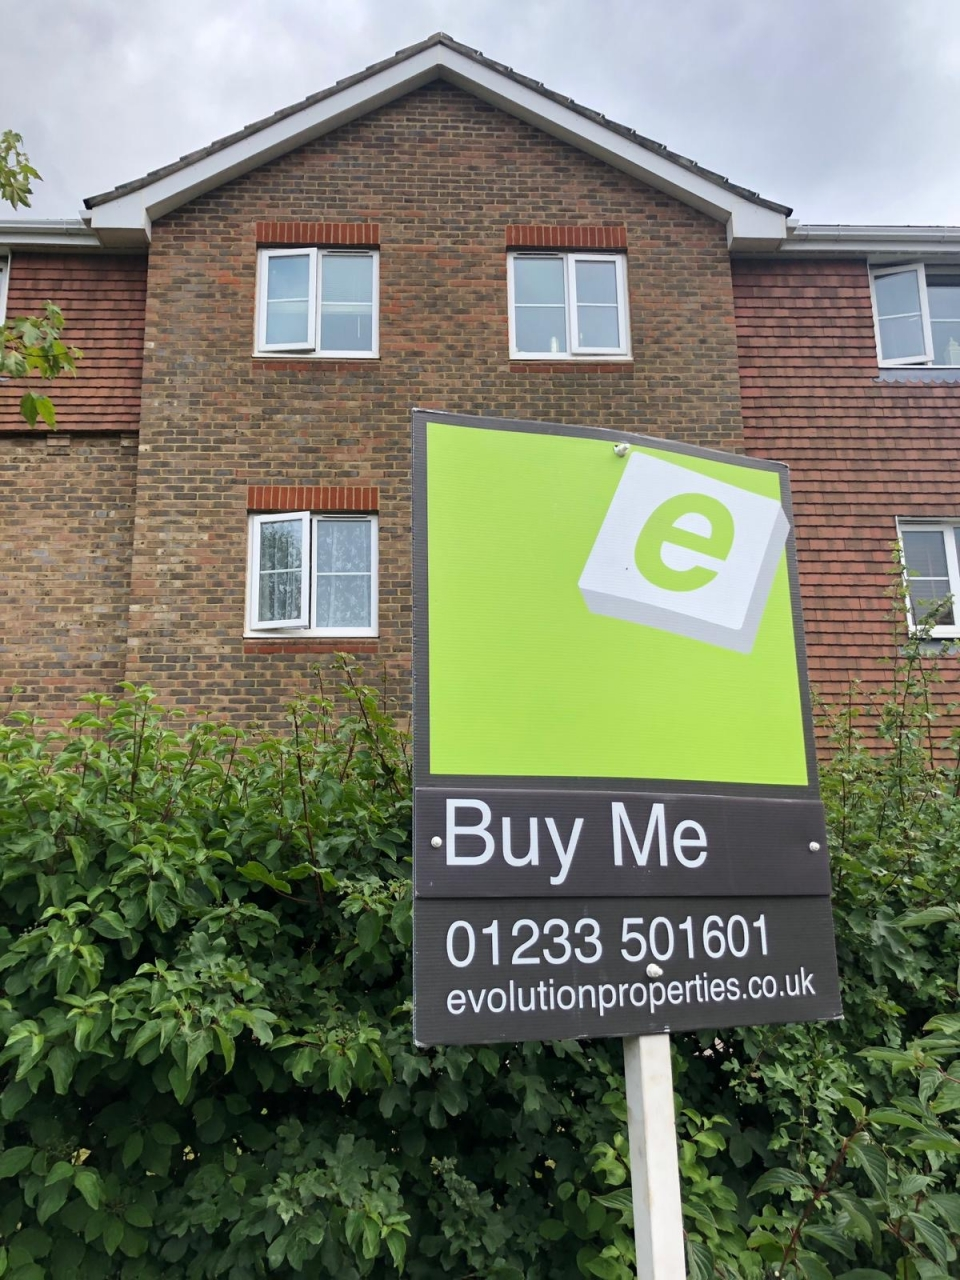 >Property market updates